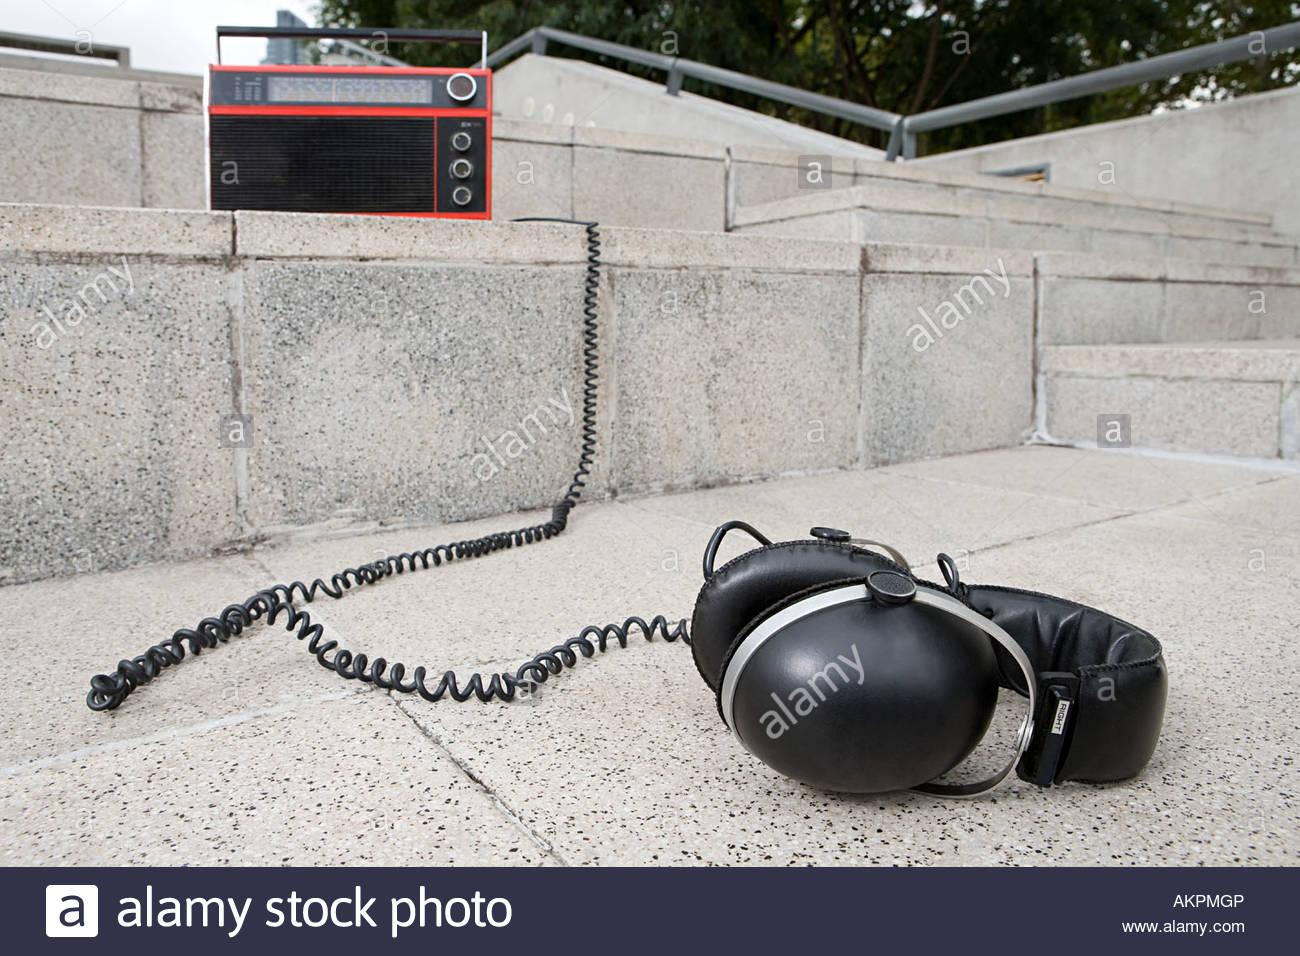 Headphones and radio on concrete steps - Stock Image